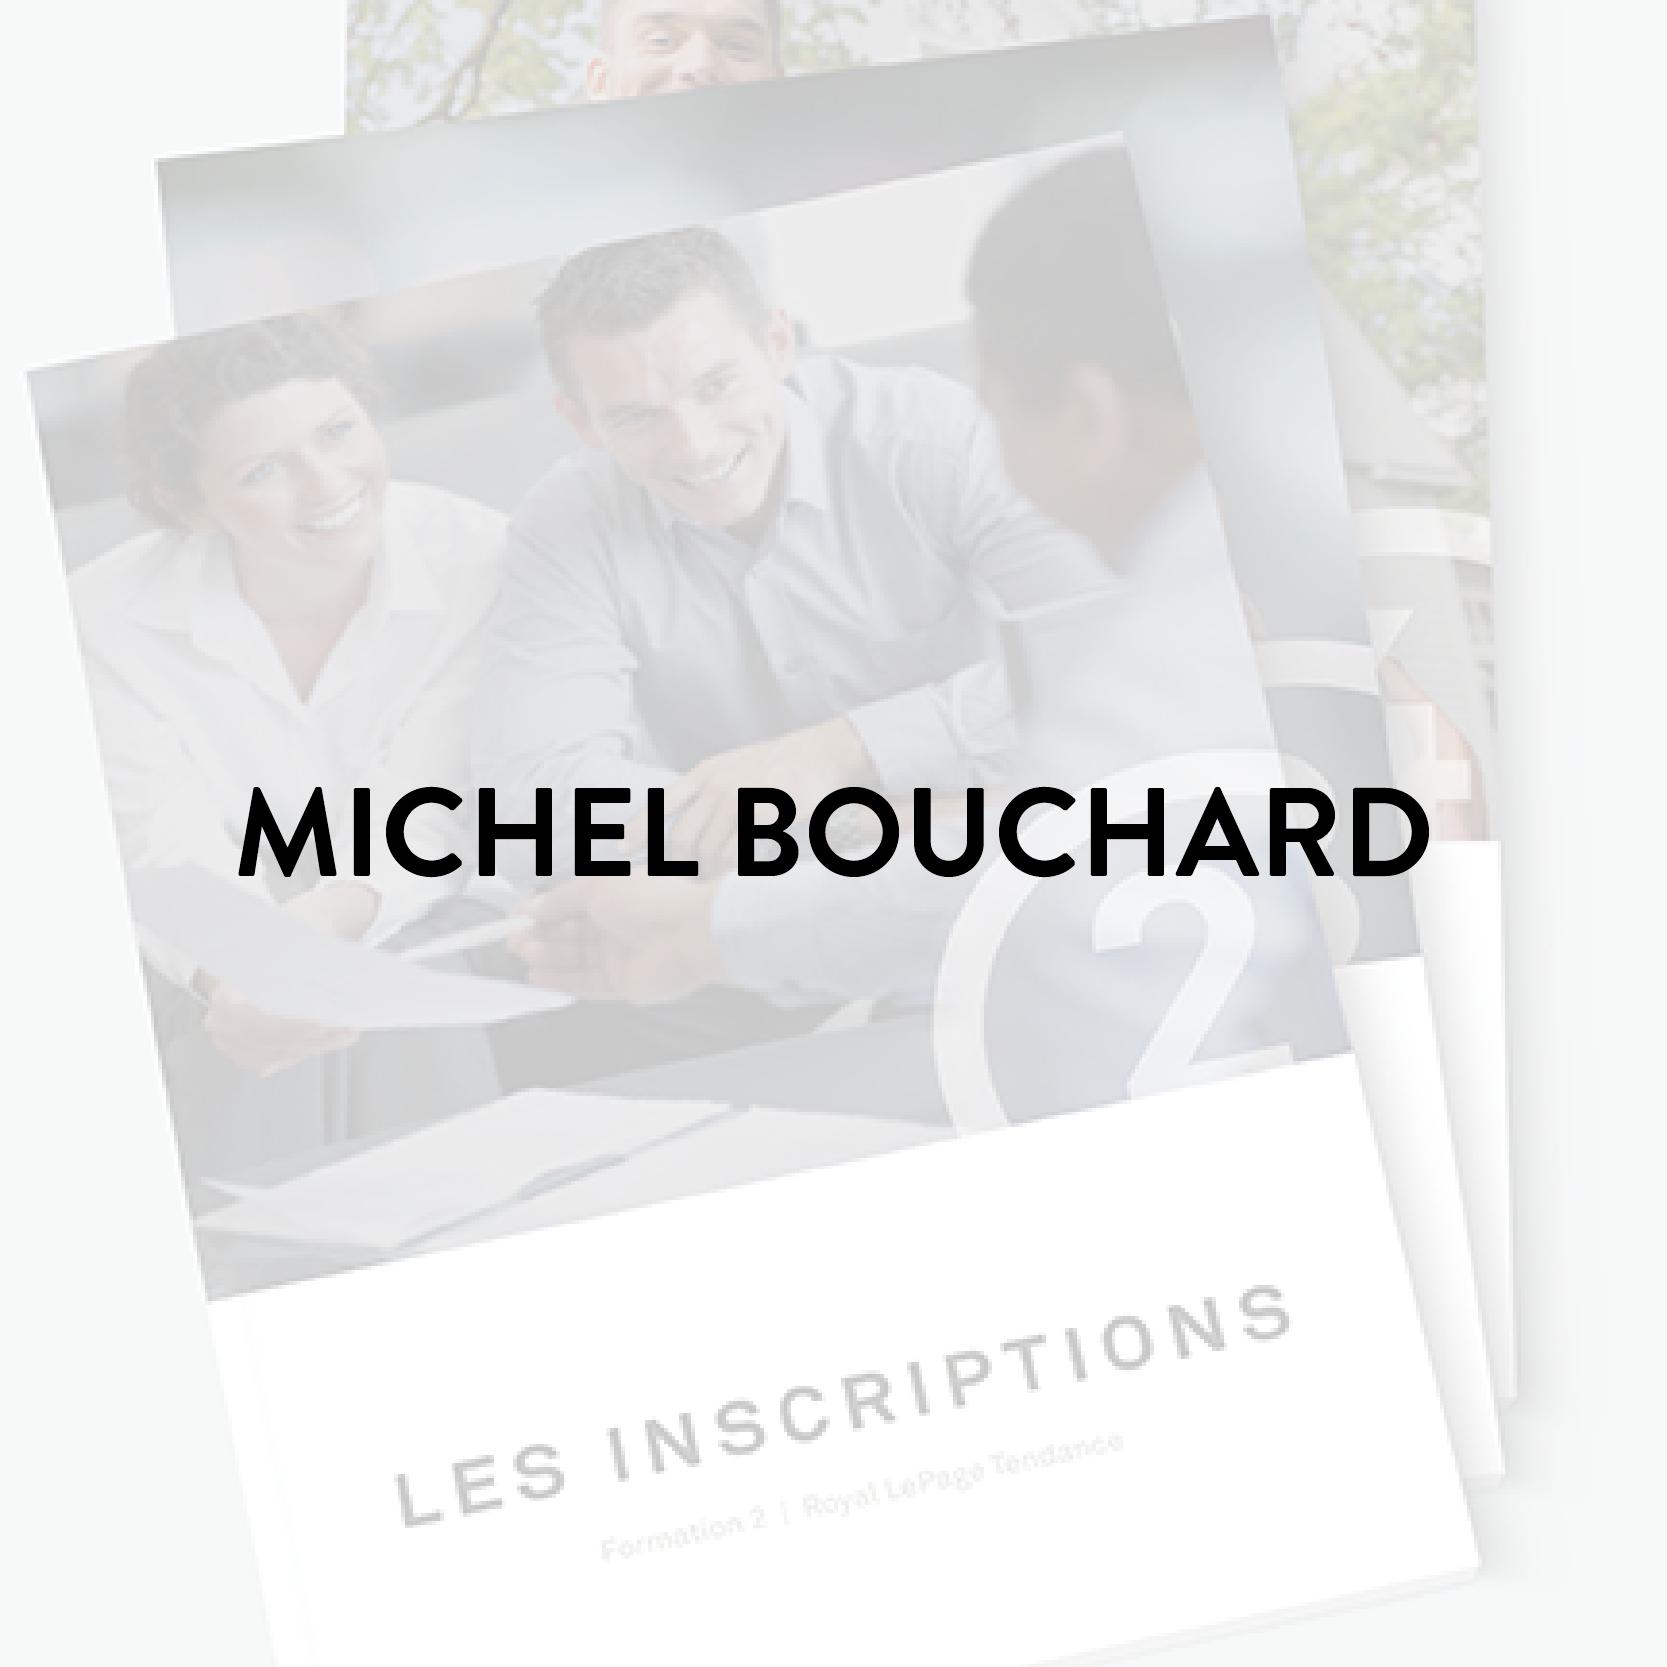 Michel Bouchard